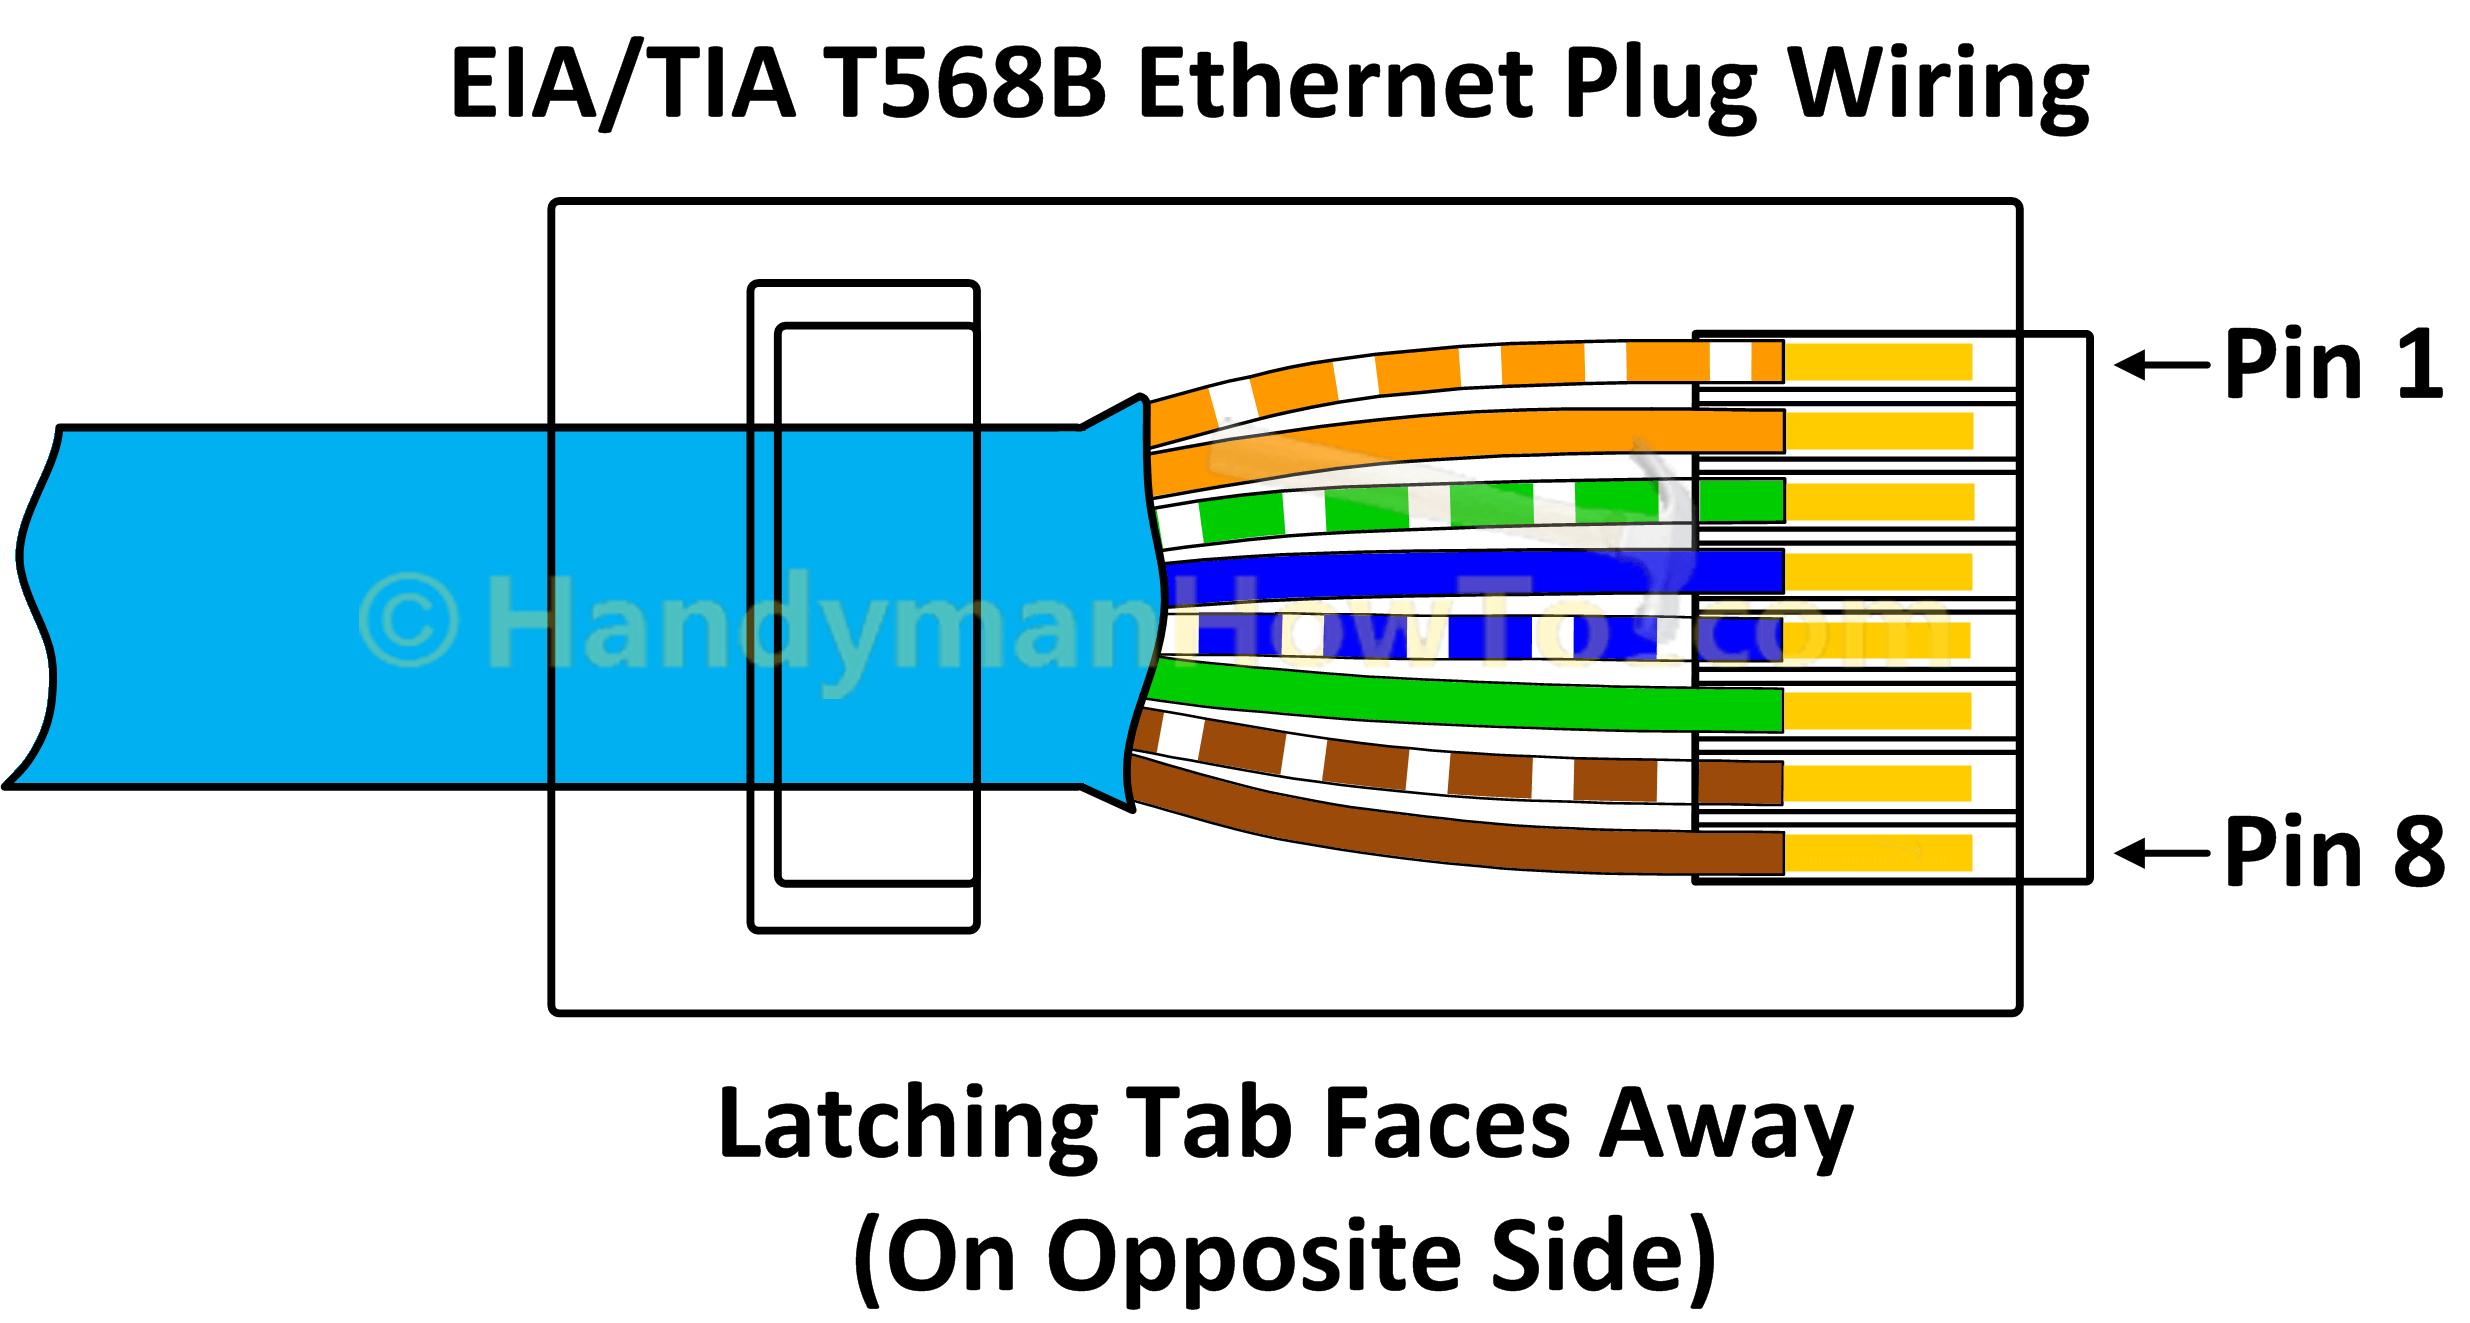 T568B Jack Wiring | Wiring Diagram - Ethernet Wall Socket Wiring Diagram